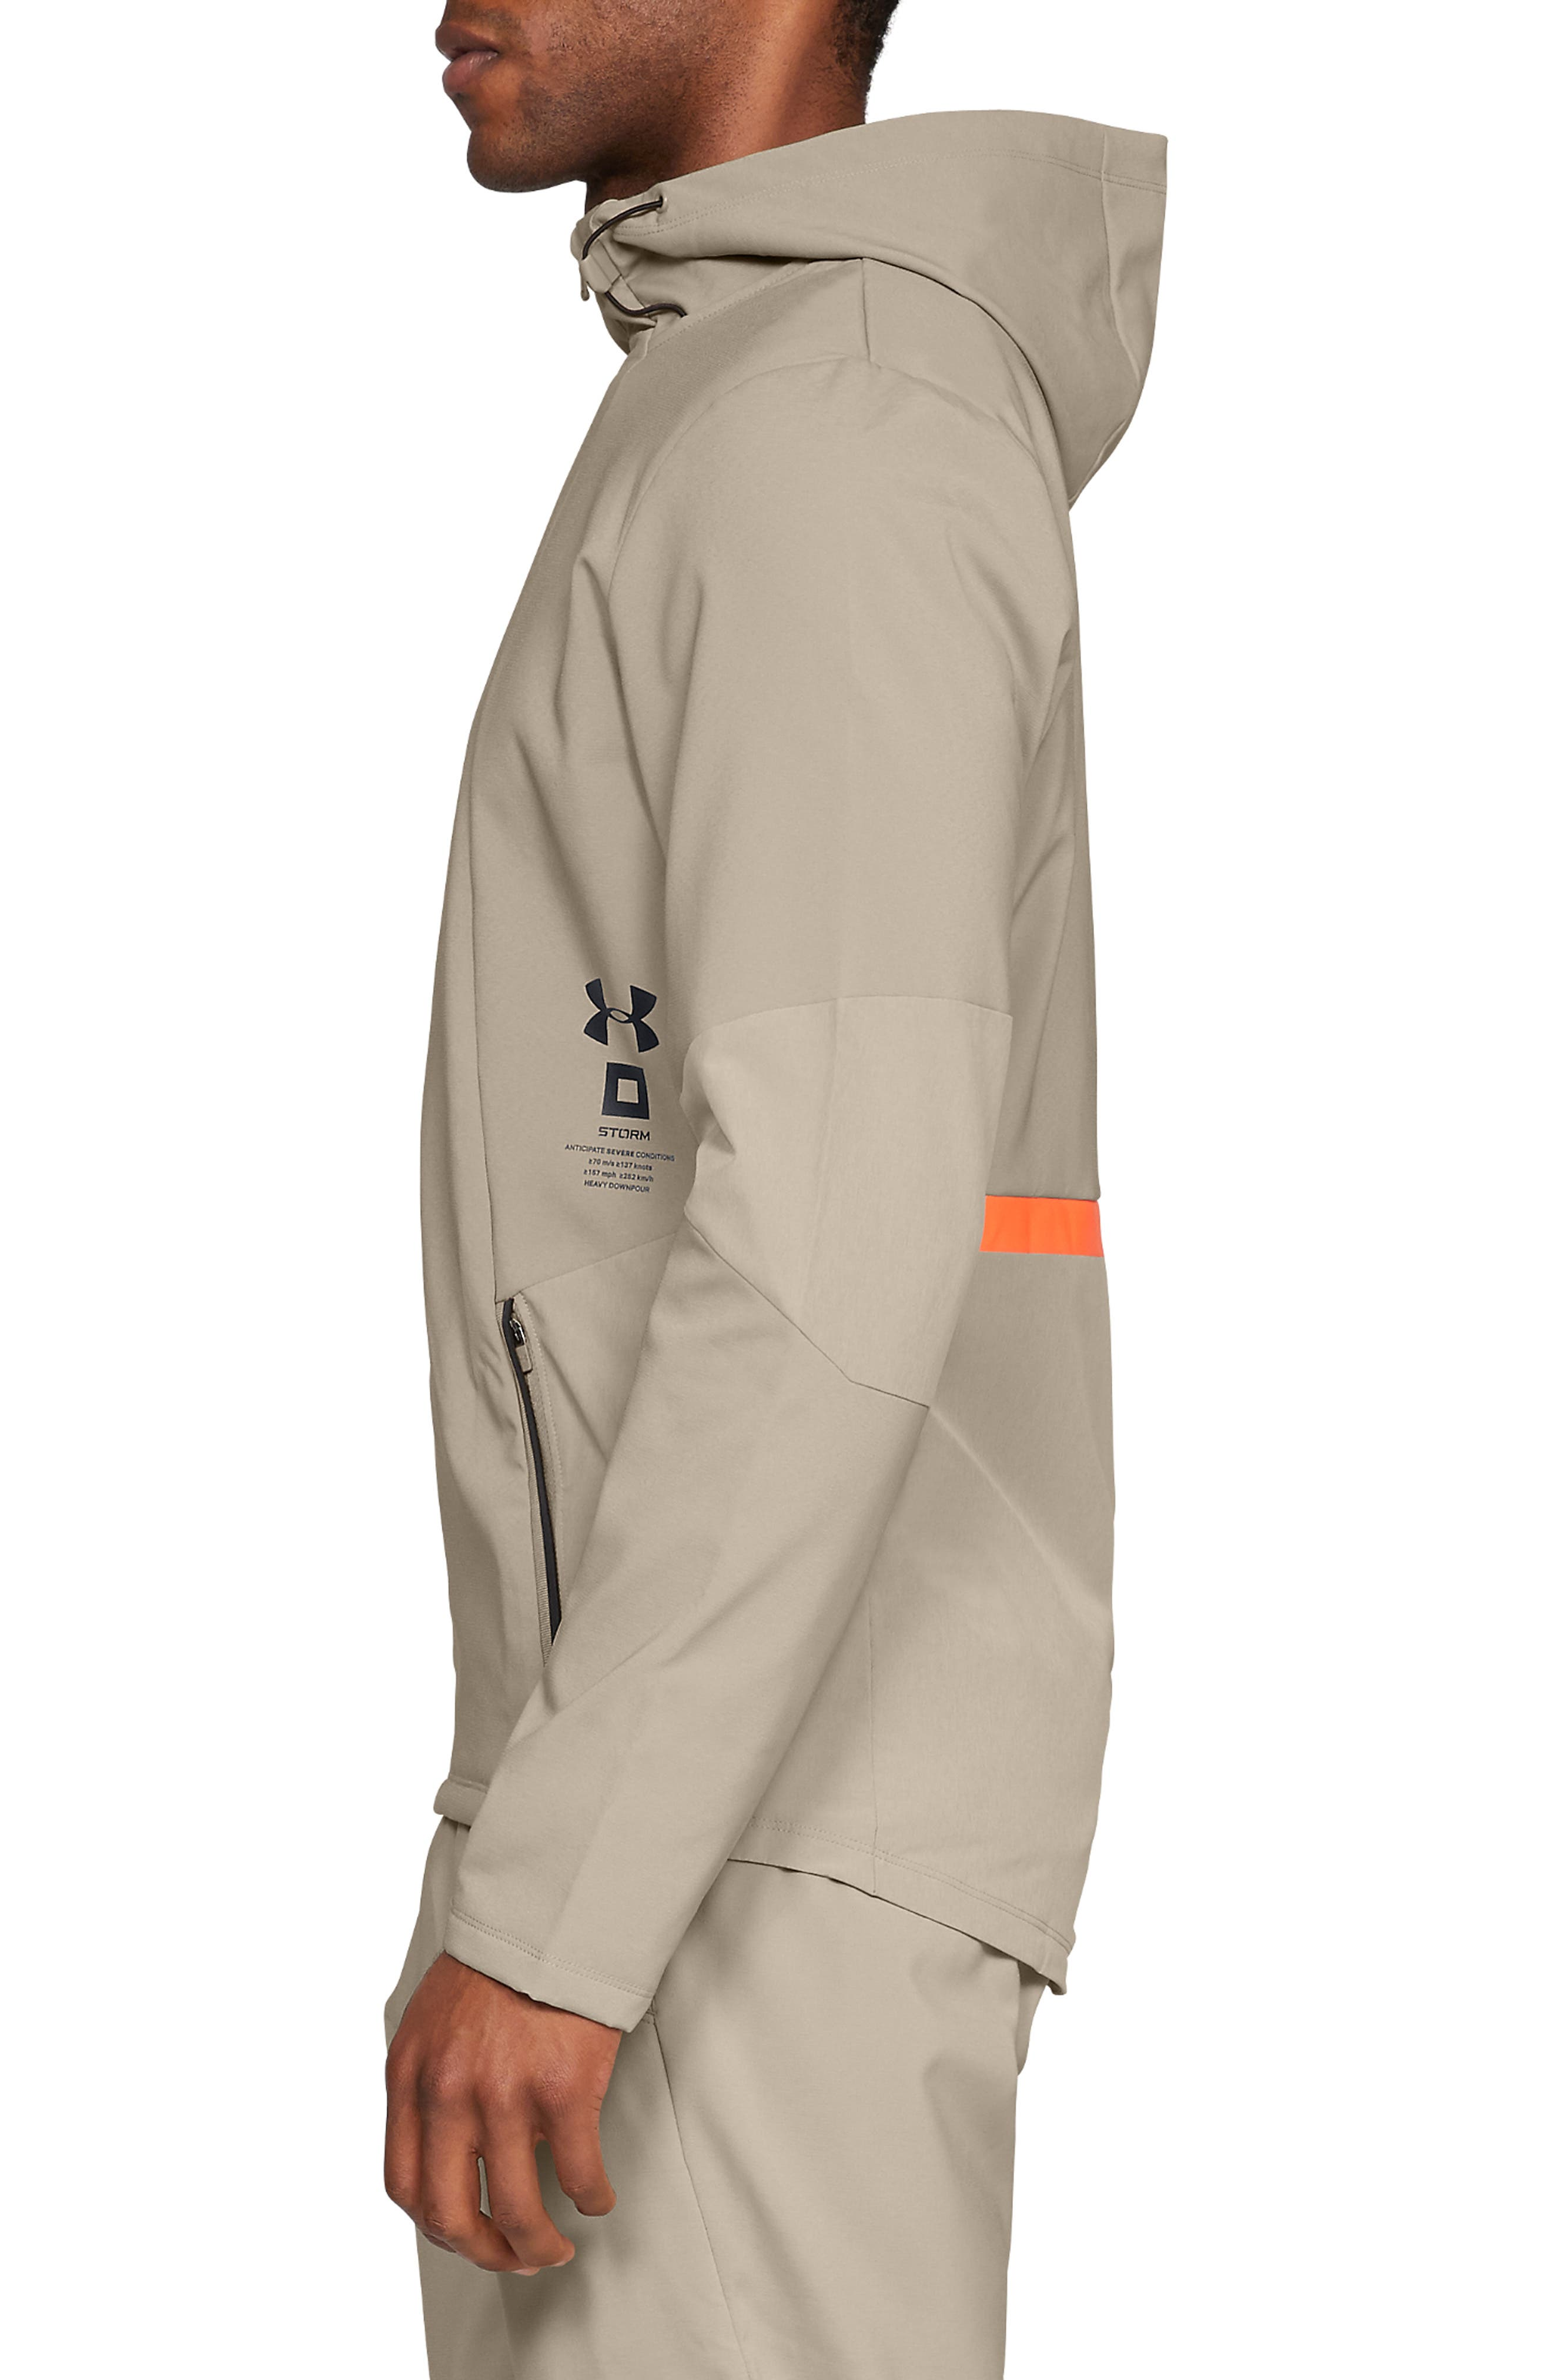 Storm Cyclone Water Repellent Hooded Jacket,                             Alternate thumbnail 3, color,                             CITY KHAKI/ BLACK